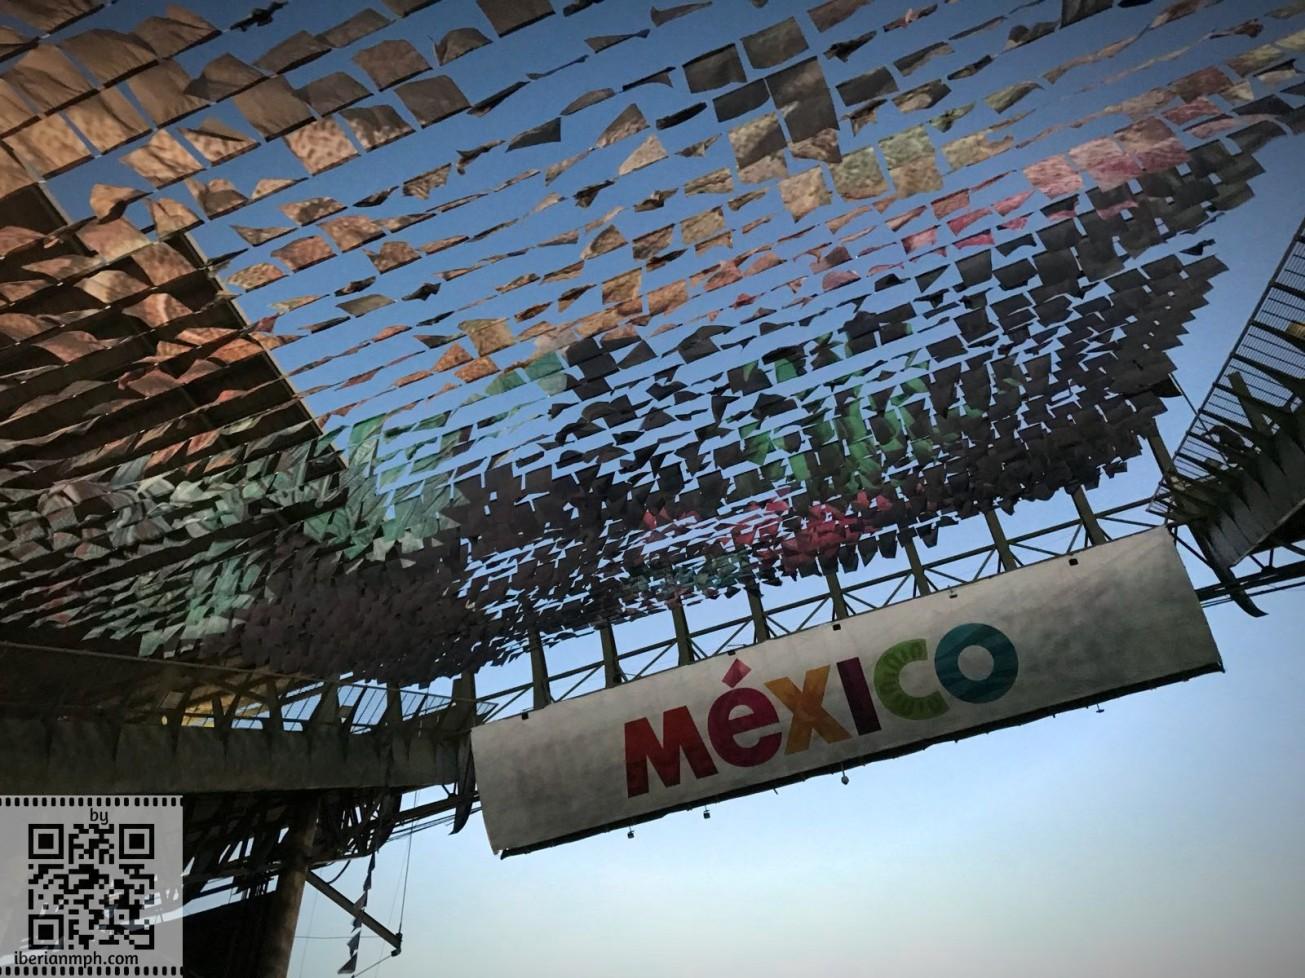 MexicoGP 2017 (9)